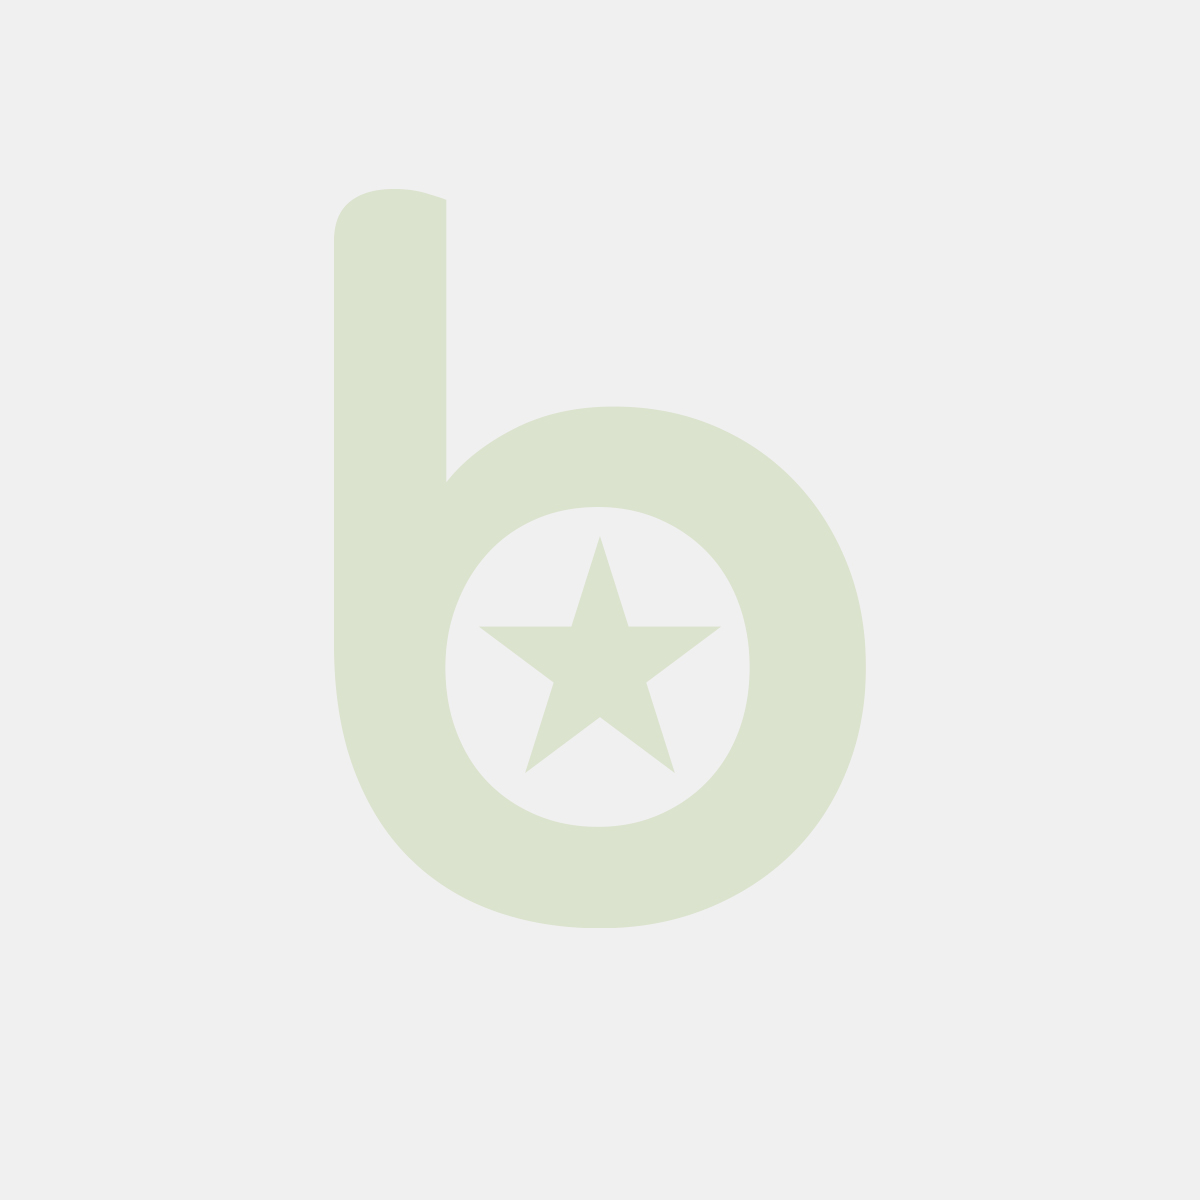 Taca drewnopodobna prostokątna 53x32cm szara GN1/1, melamina